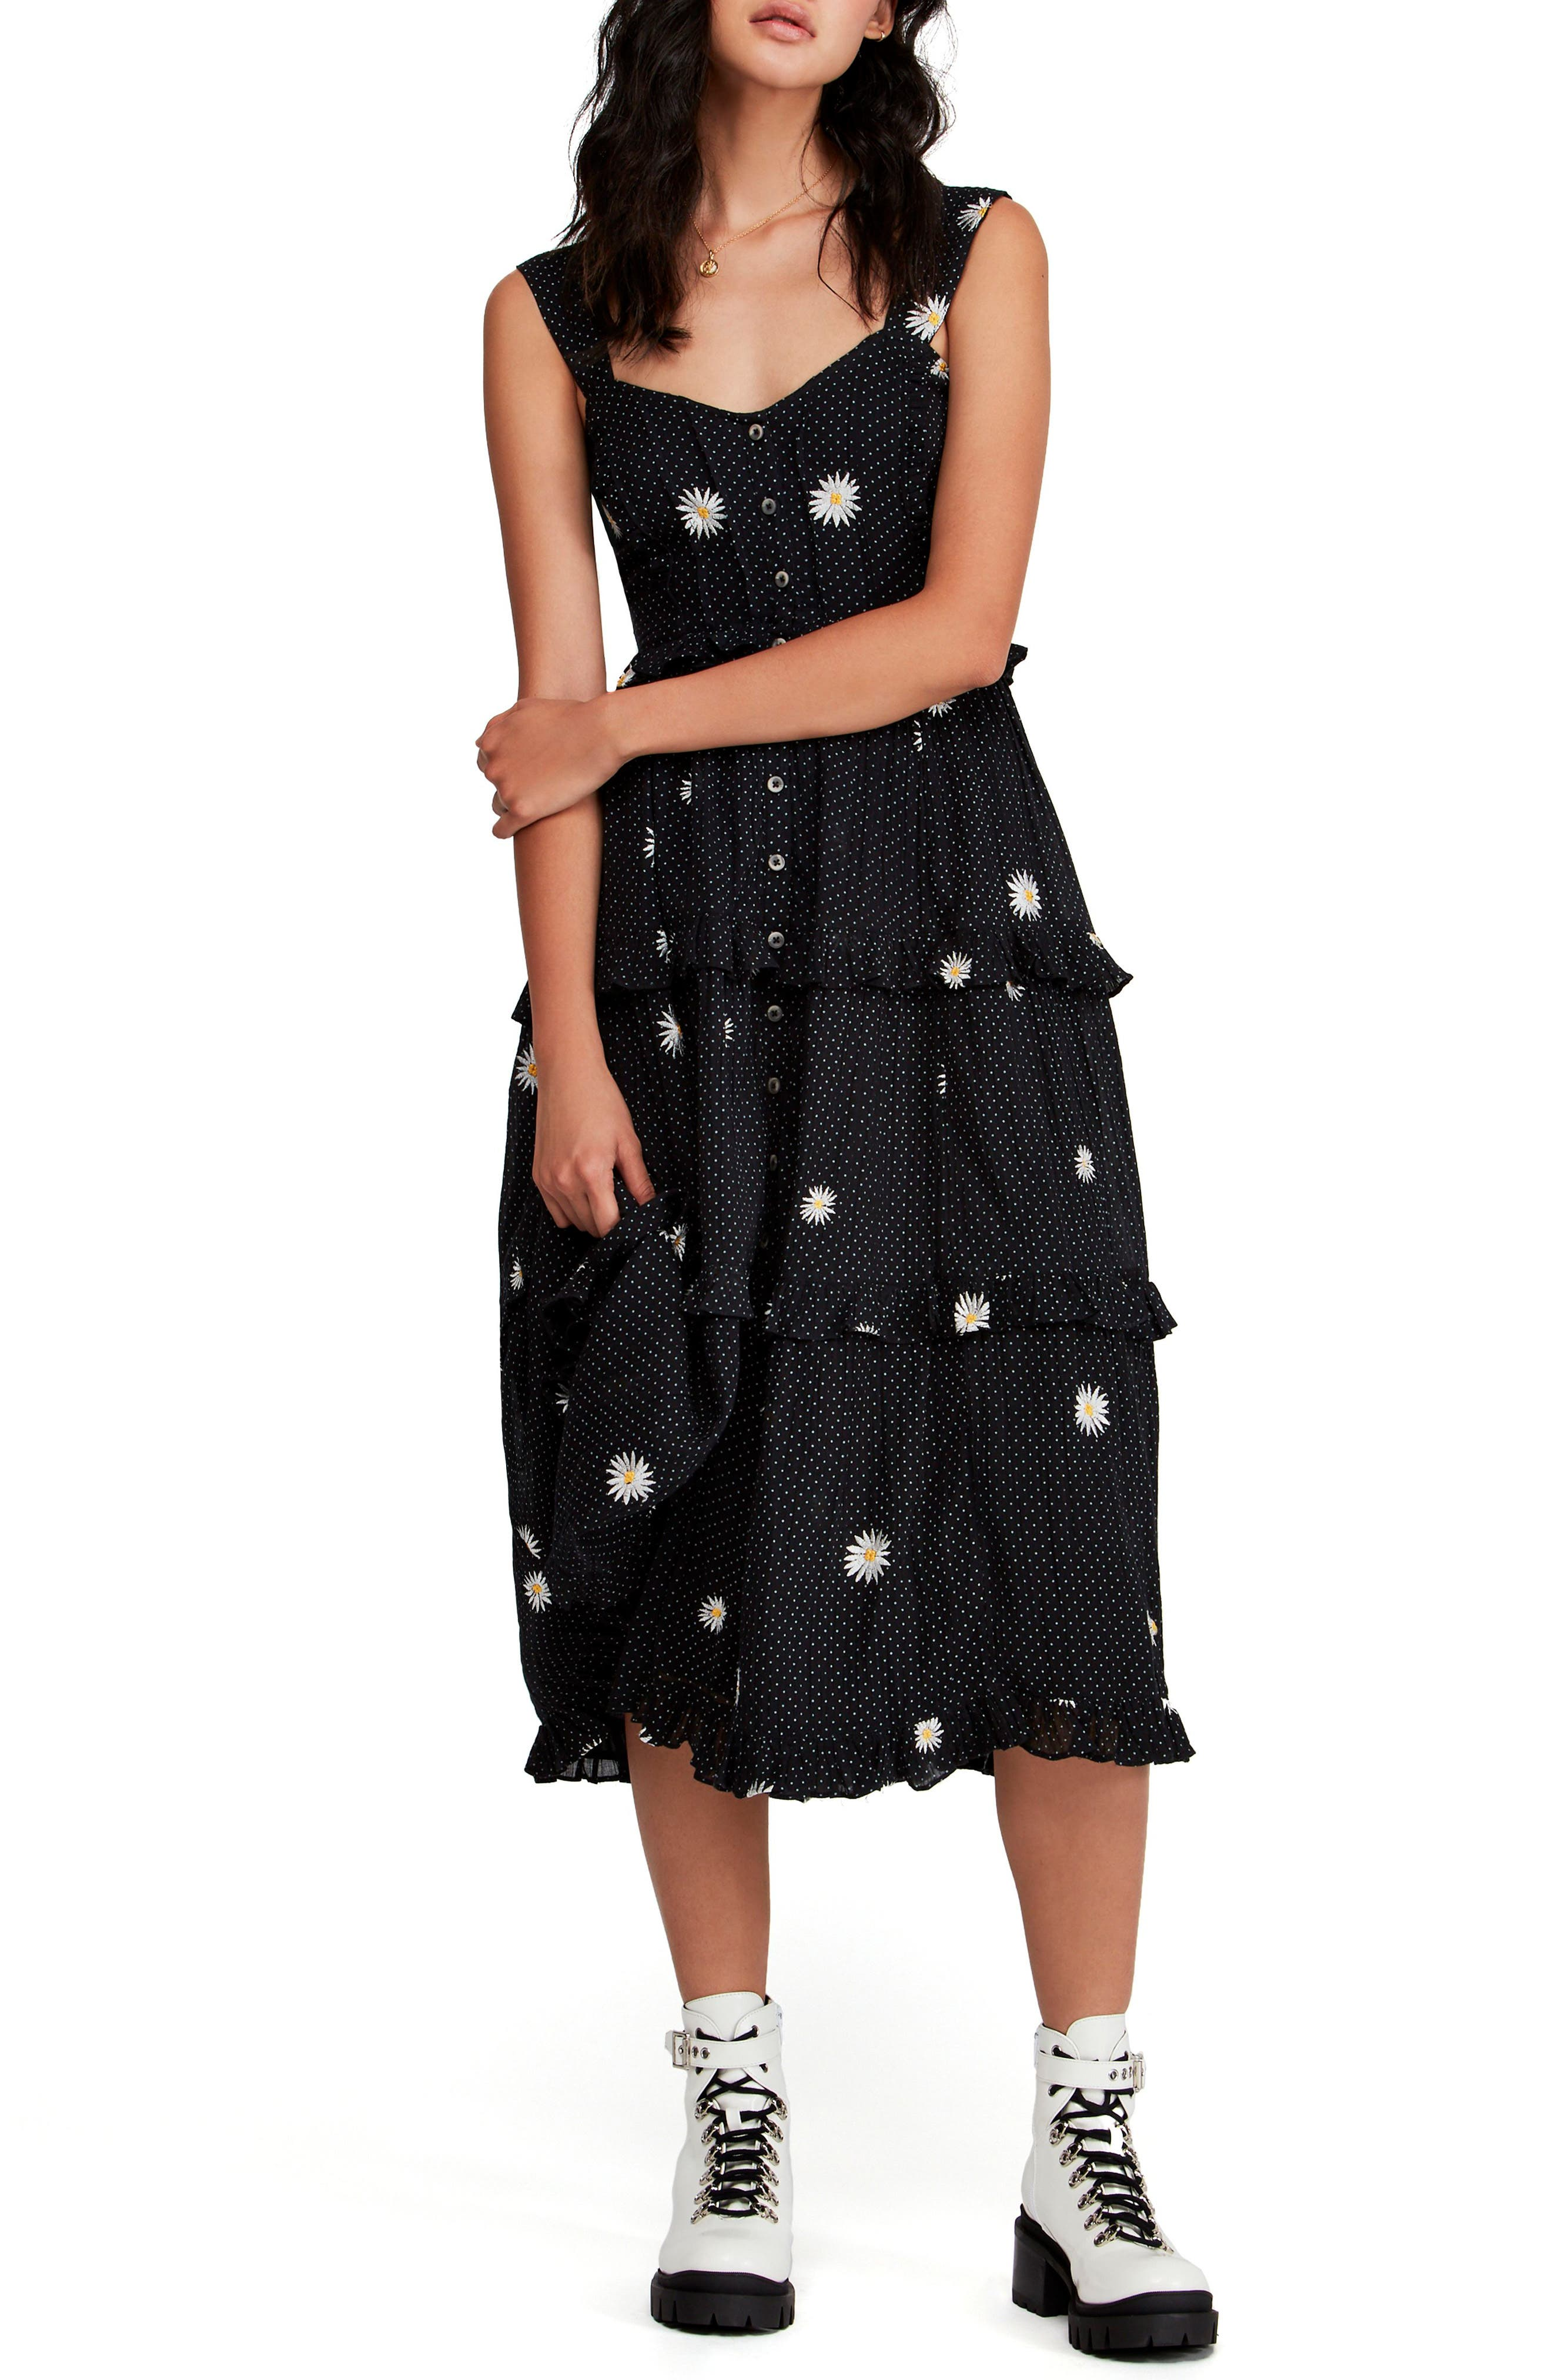 Free People Daisy Chain Midi Dress, Black